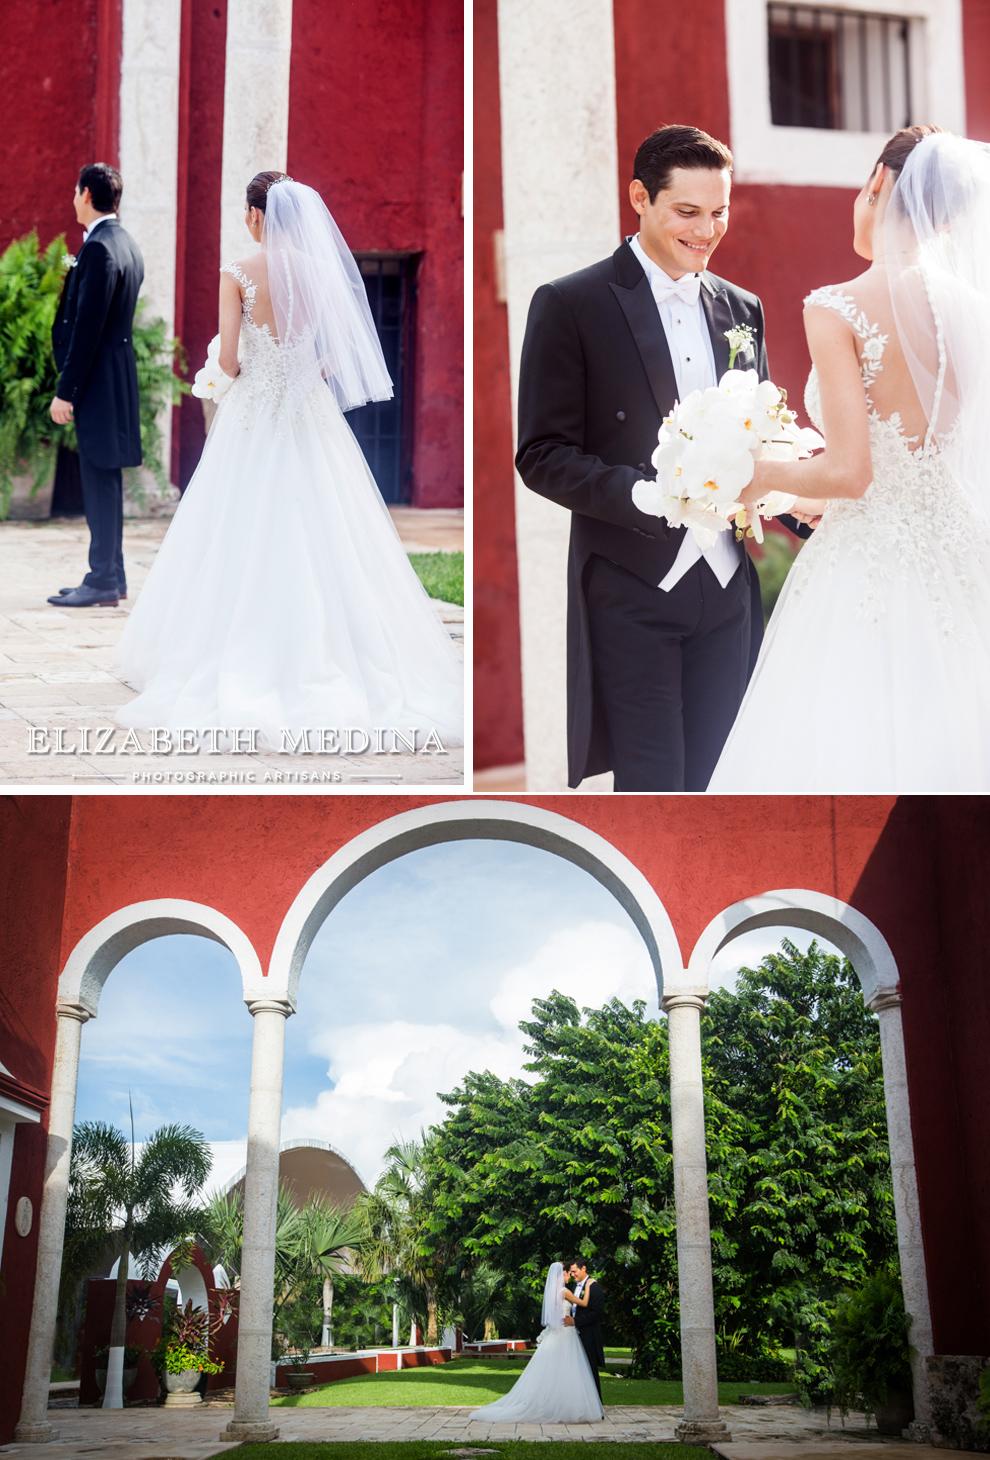 elizabeth_medina_merida_photographer_813_011 Lula and Daniel, Hacienda San Diego Cutz Wedding